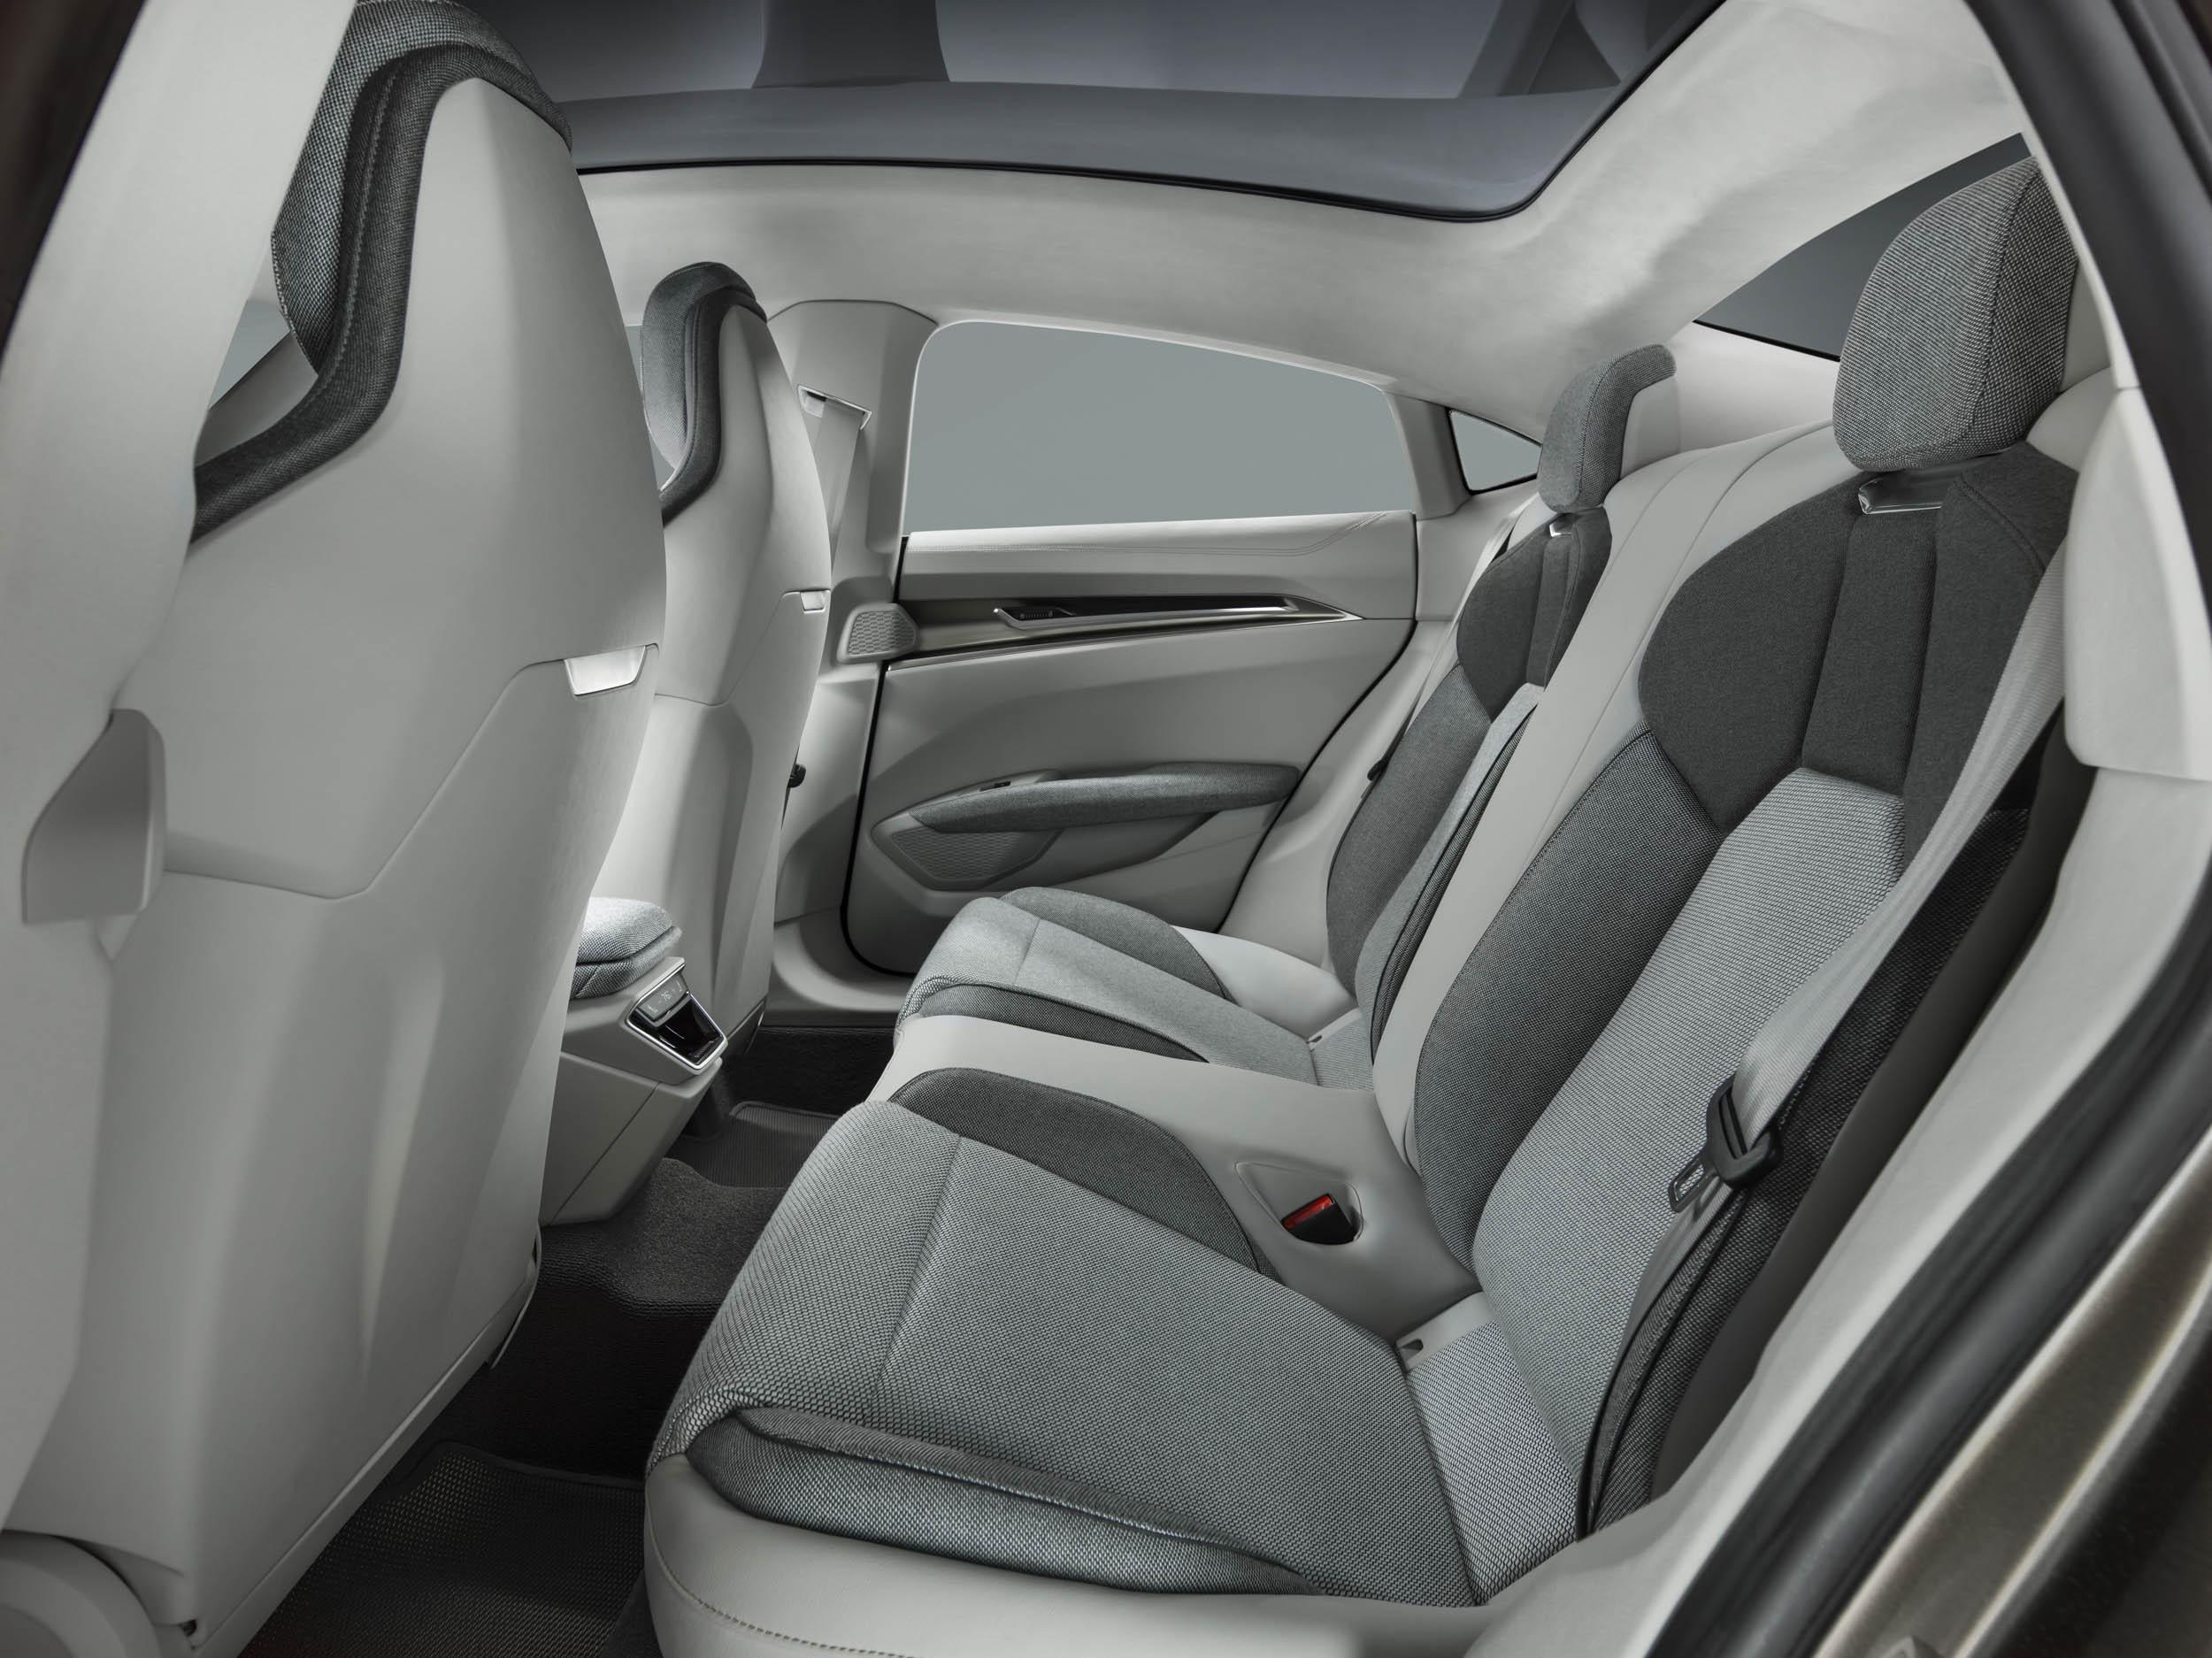 Audi e-tron GT backseat interior